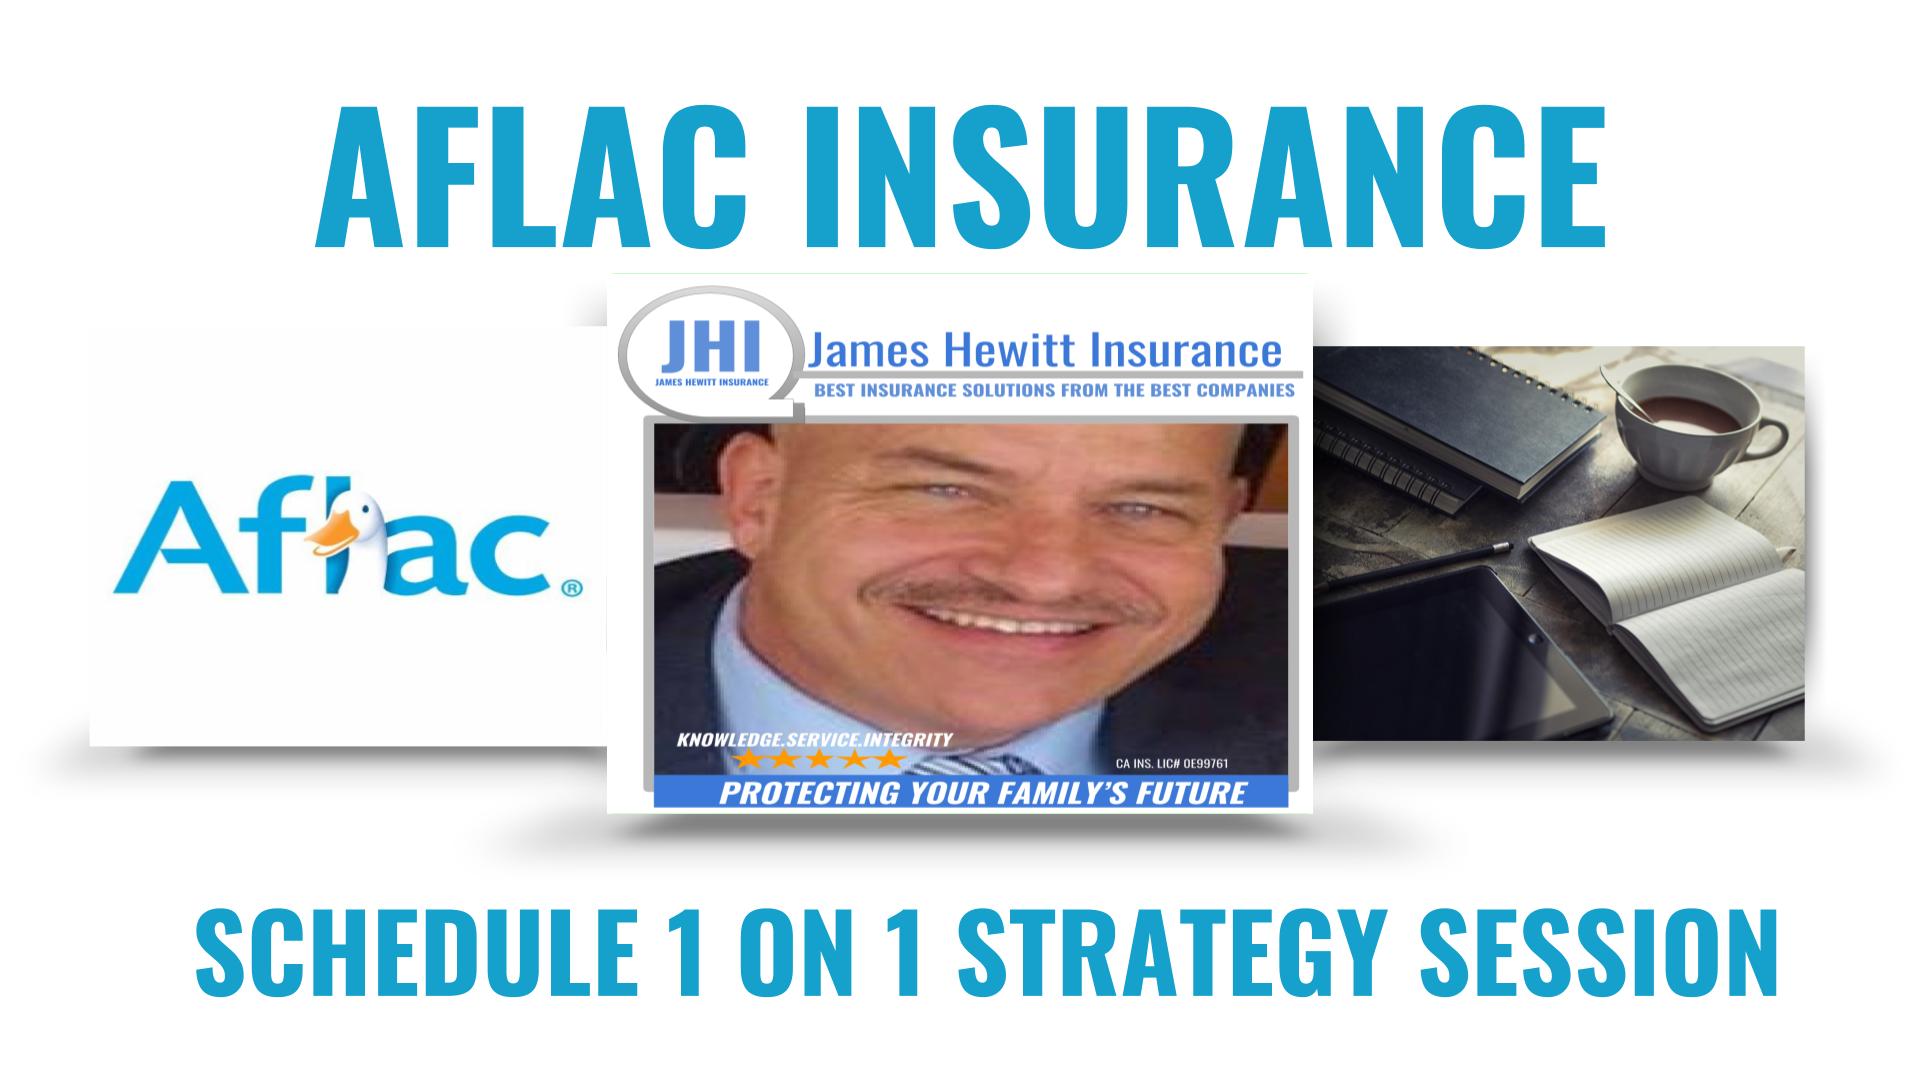 James Hewitt Insurance image 19